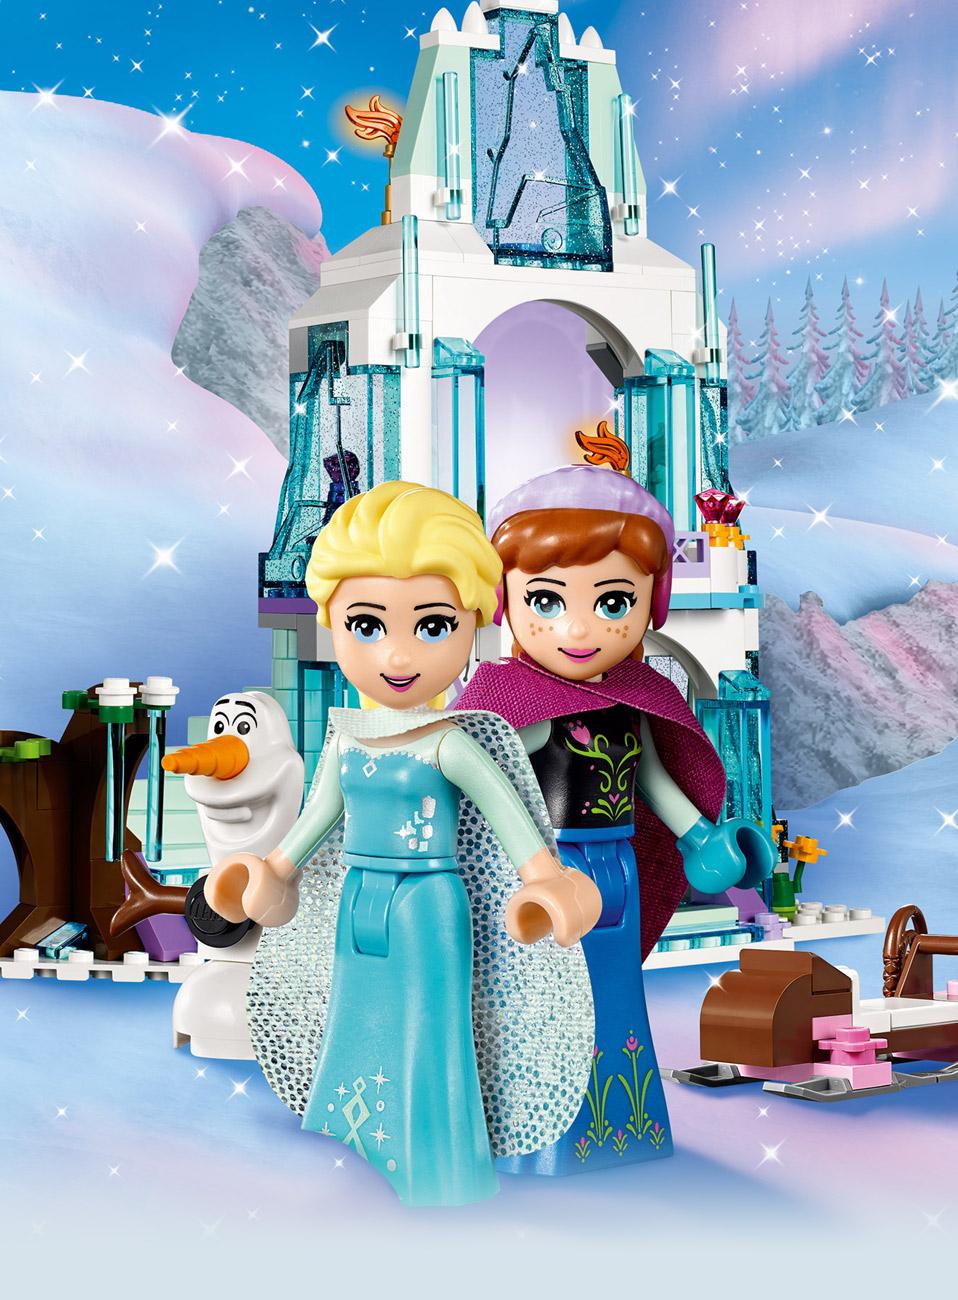 Lego disney princess lego lek gadgets for Mobilia webhallen